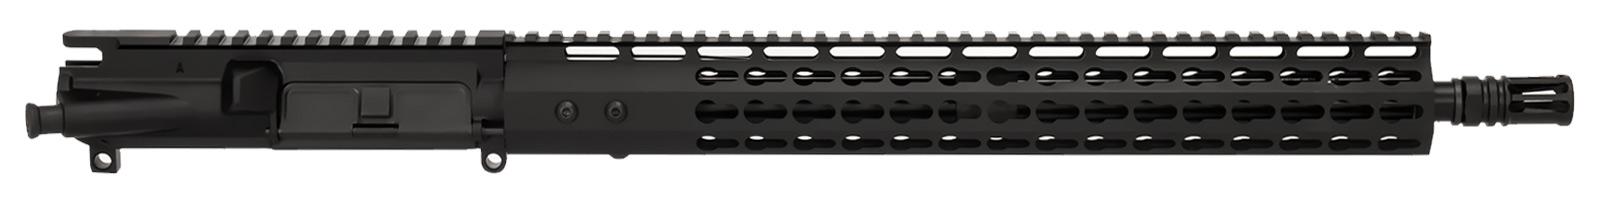 ar-15-complete-upper-assembly-16-7-62-x-39-15-cbc-keymod-ii-ar-15-handguard-rail